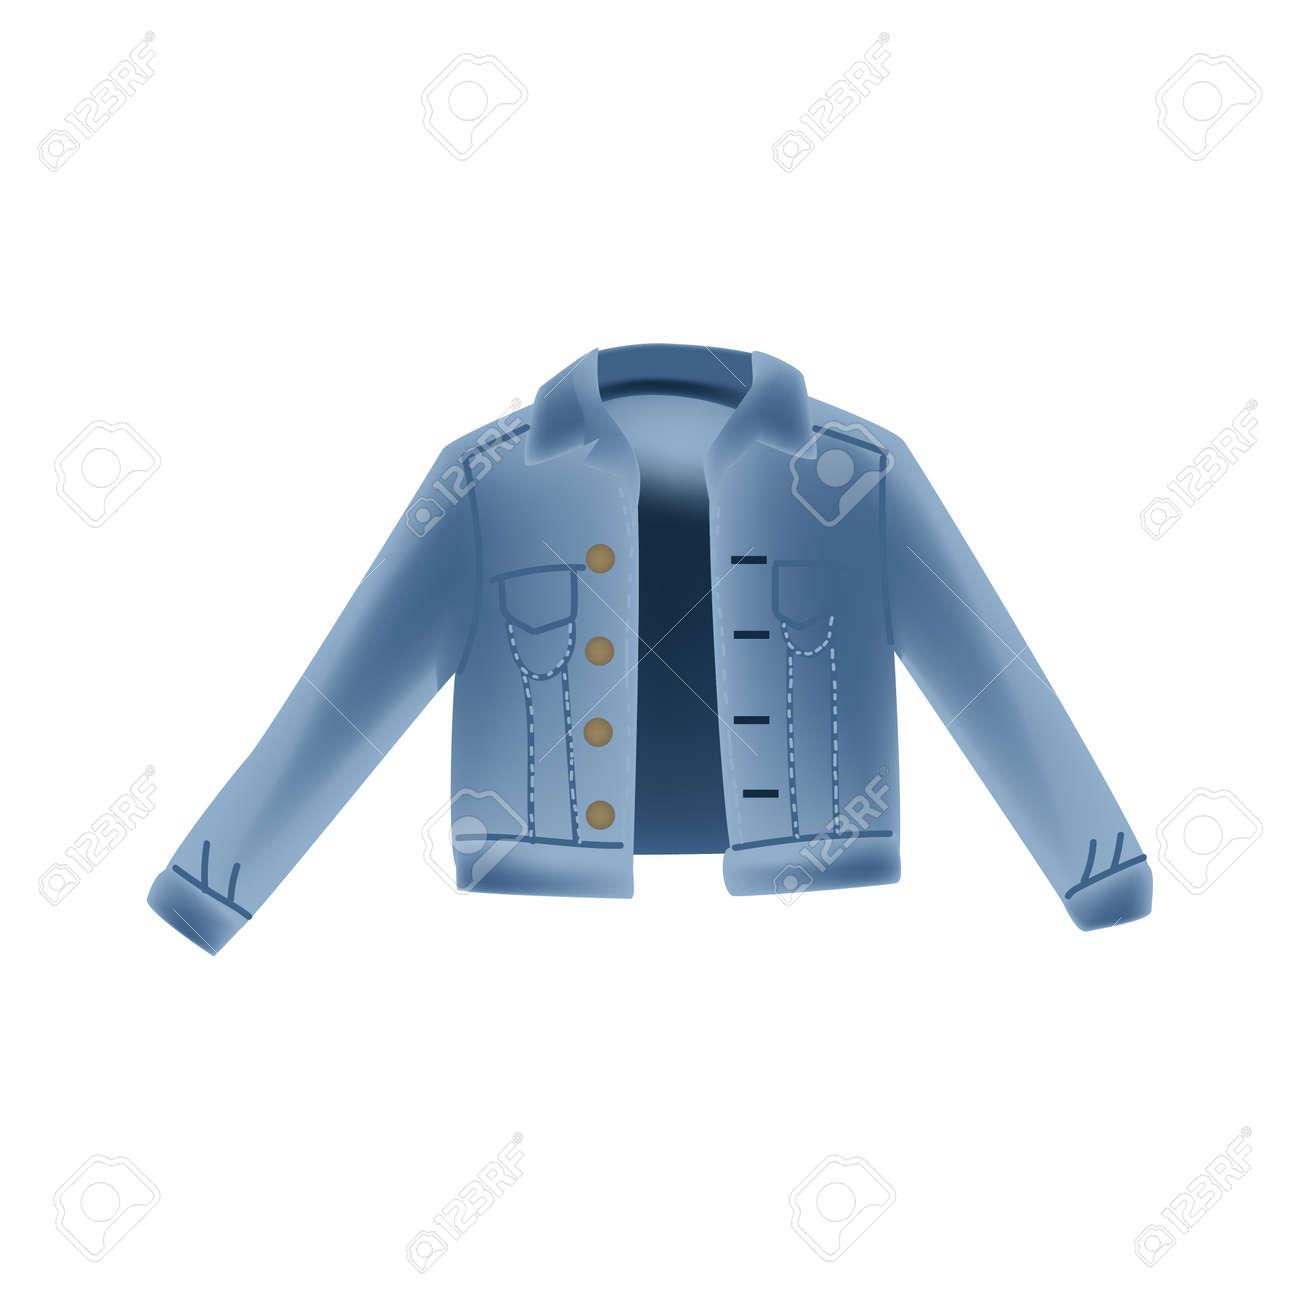 51e6dbd07 Ilustración de realismo con chaqueta vaquera de jeans